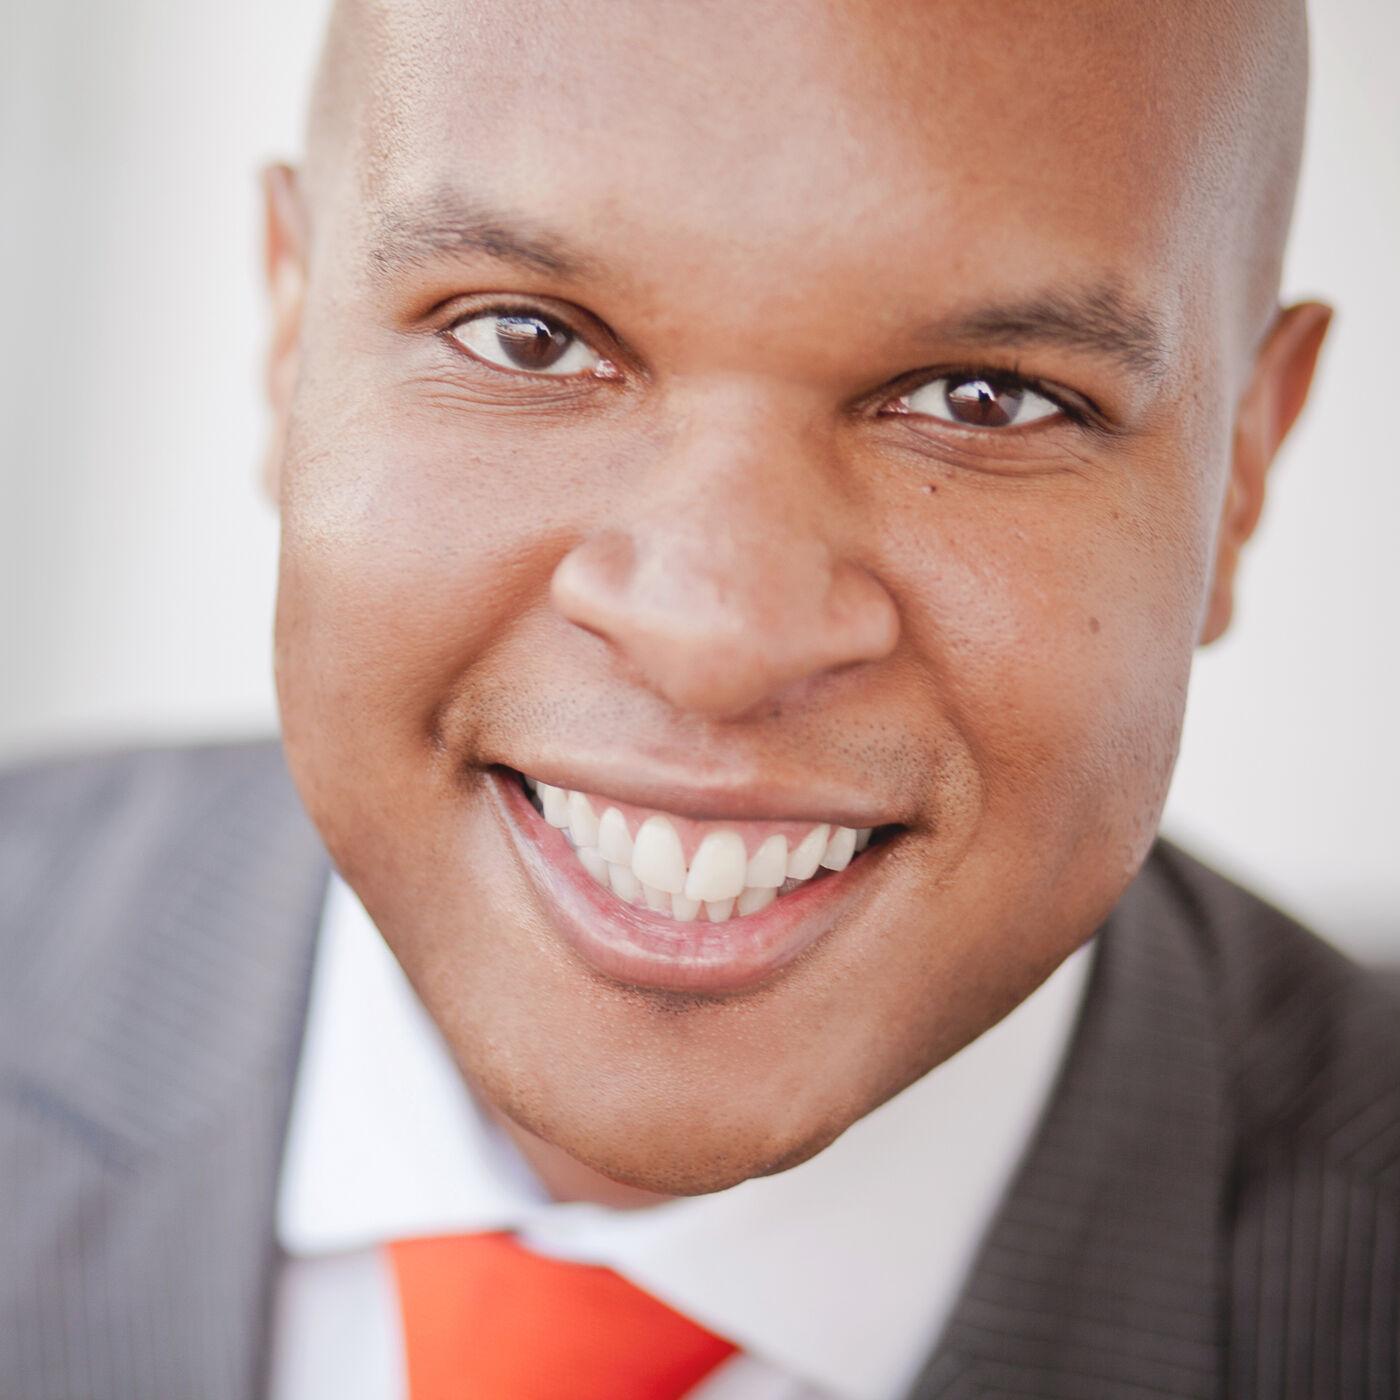 Travis Torrence - Shell Oil, Global Litigation Bankruptcy & Credit Team Lead